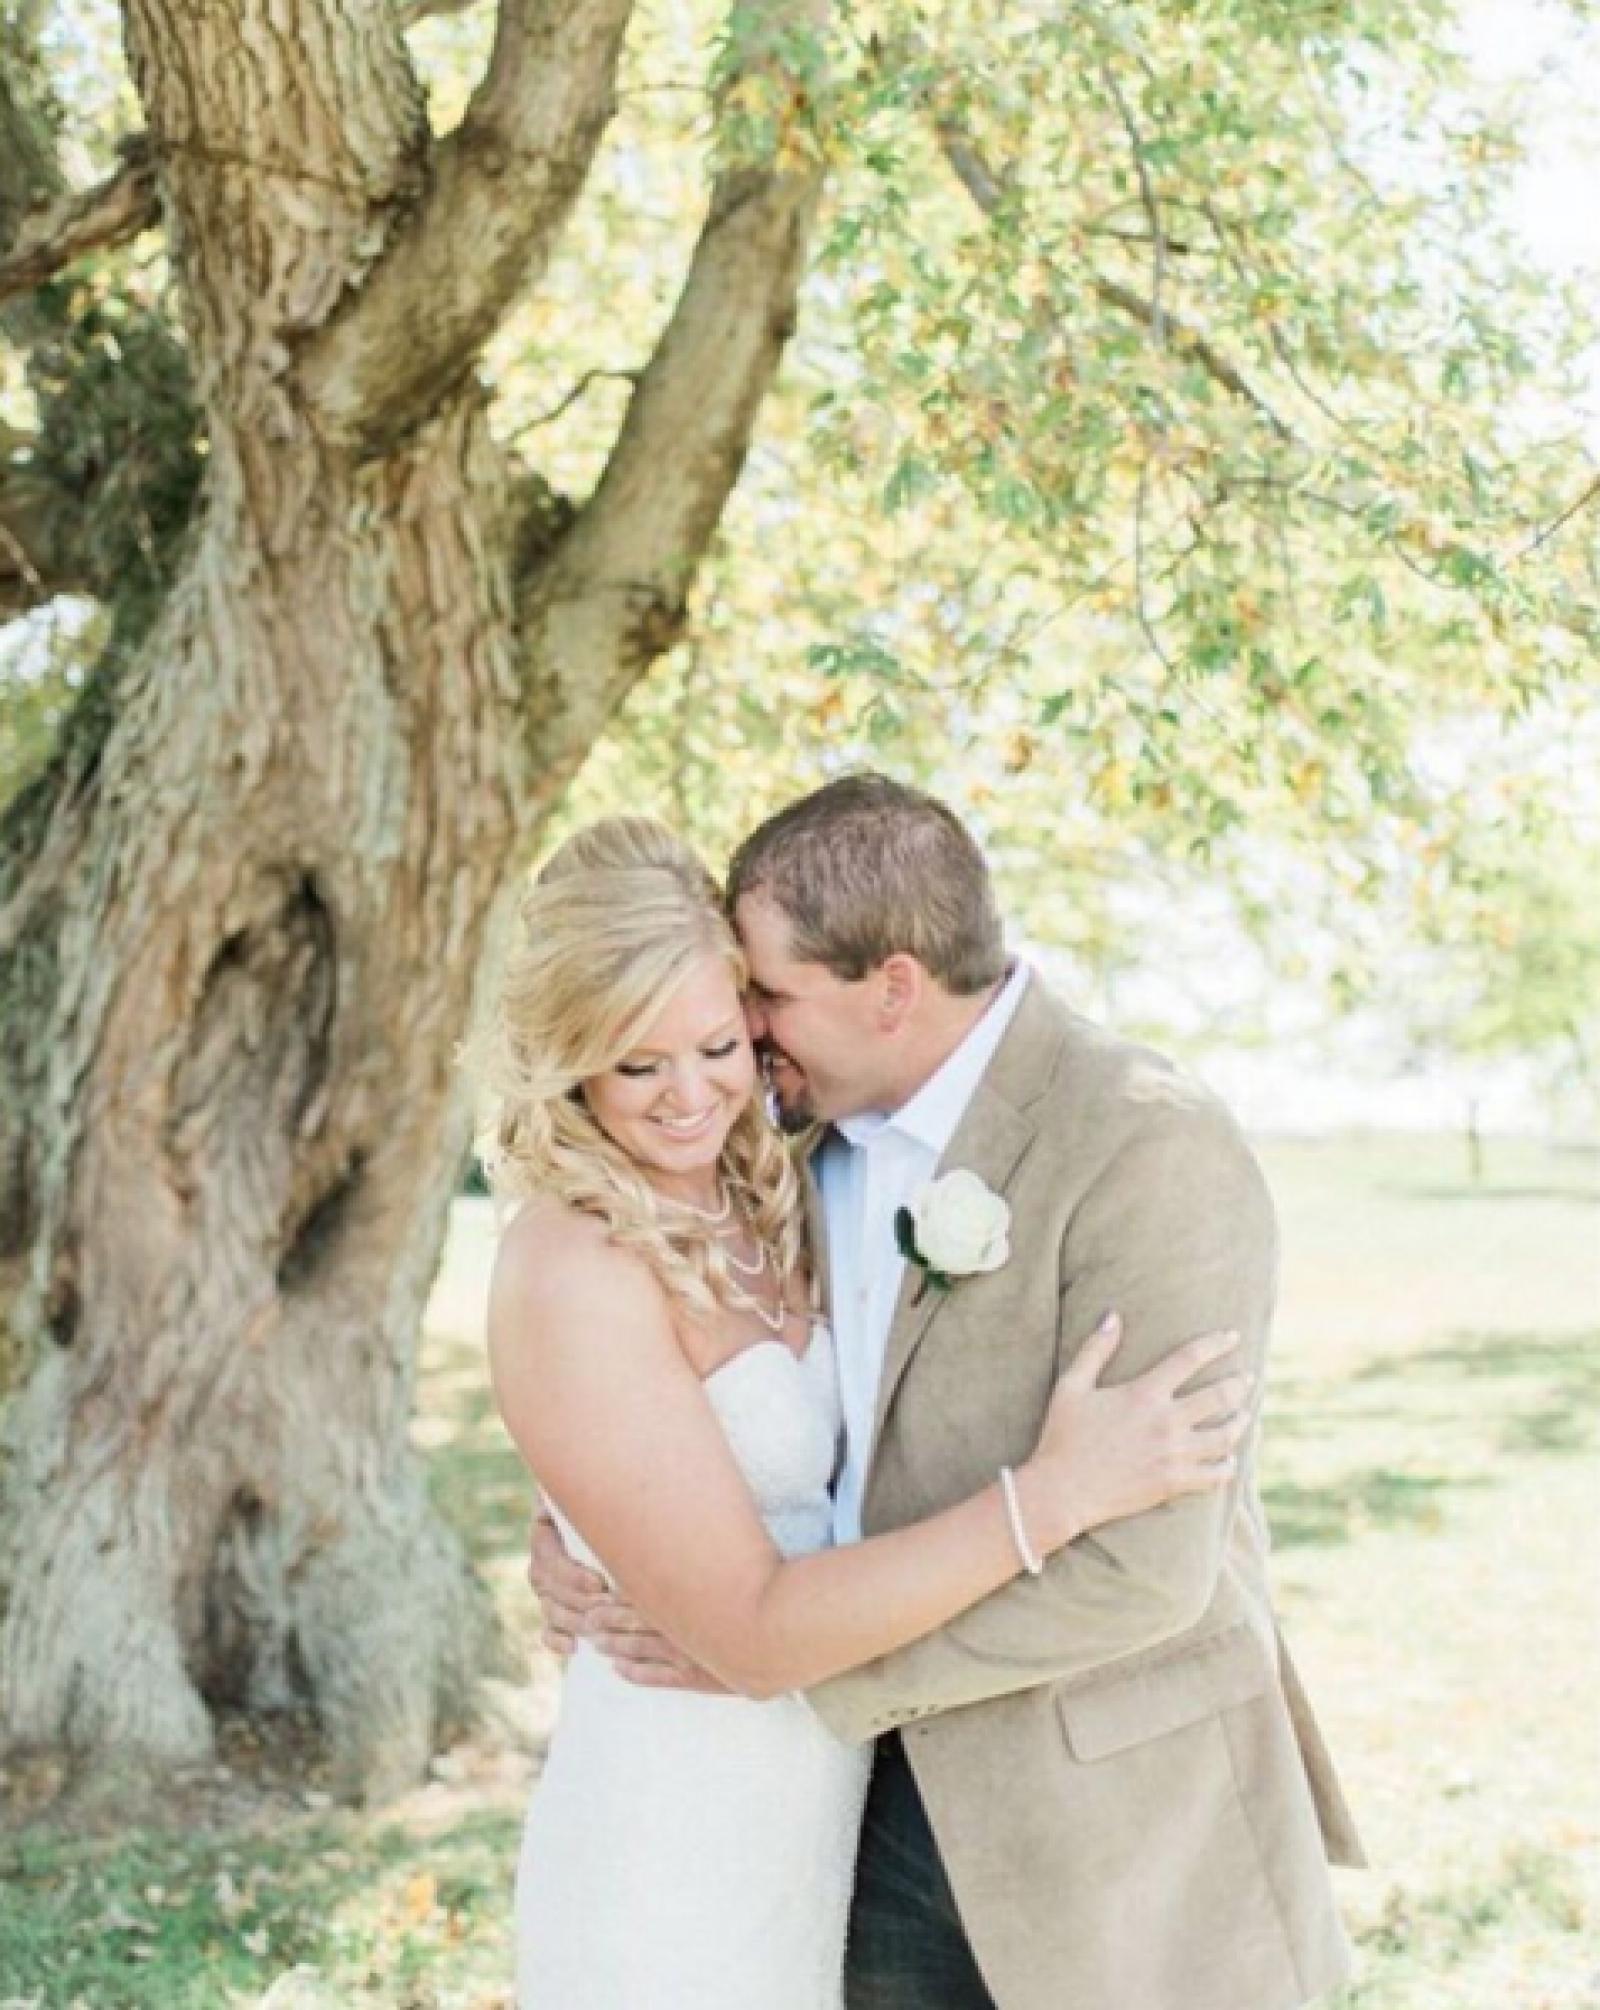 Wedding Photo Pose